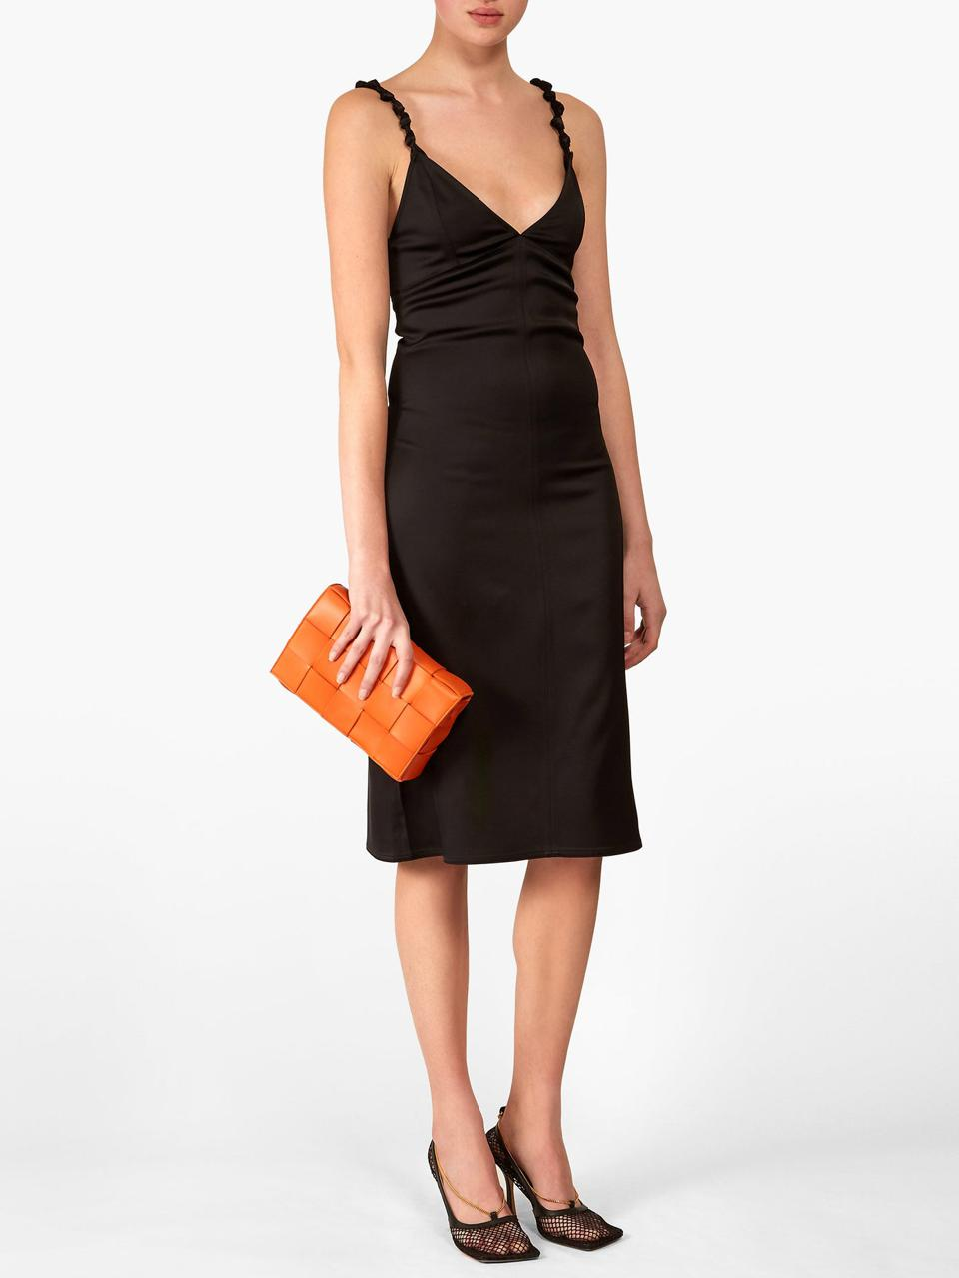 Knotted-Strap Dress by Bottega Veneta